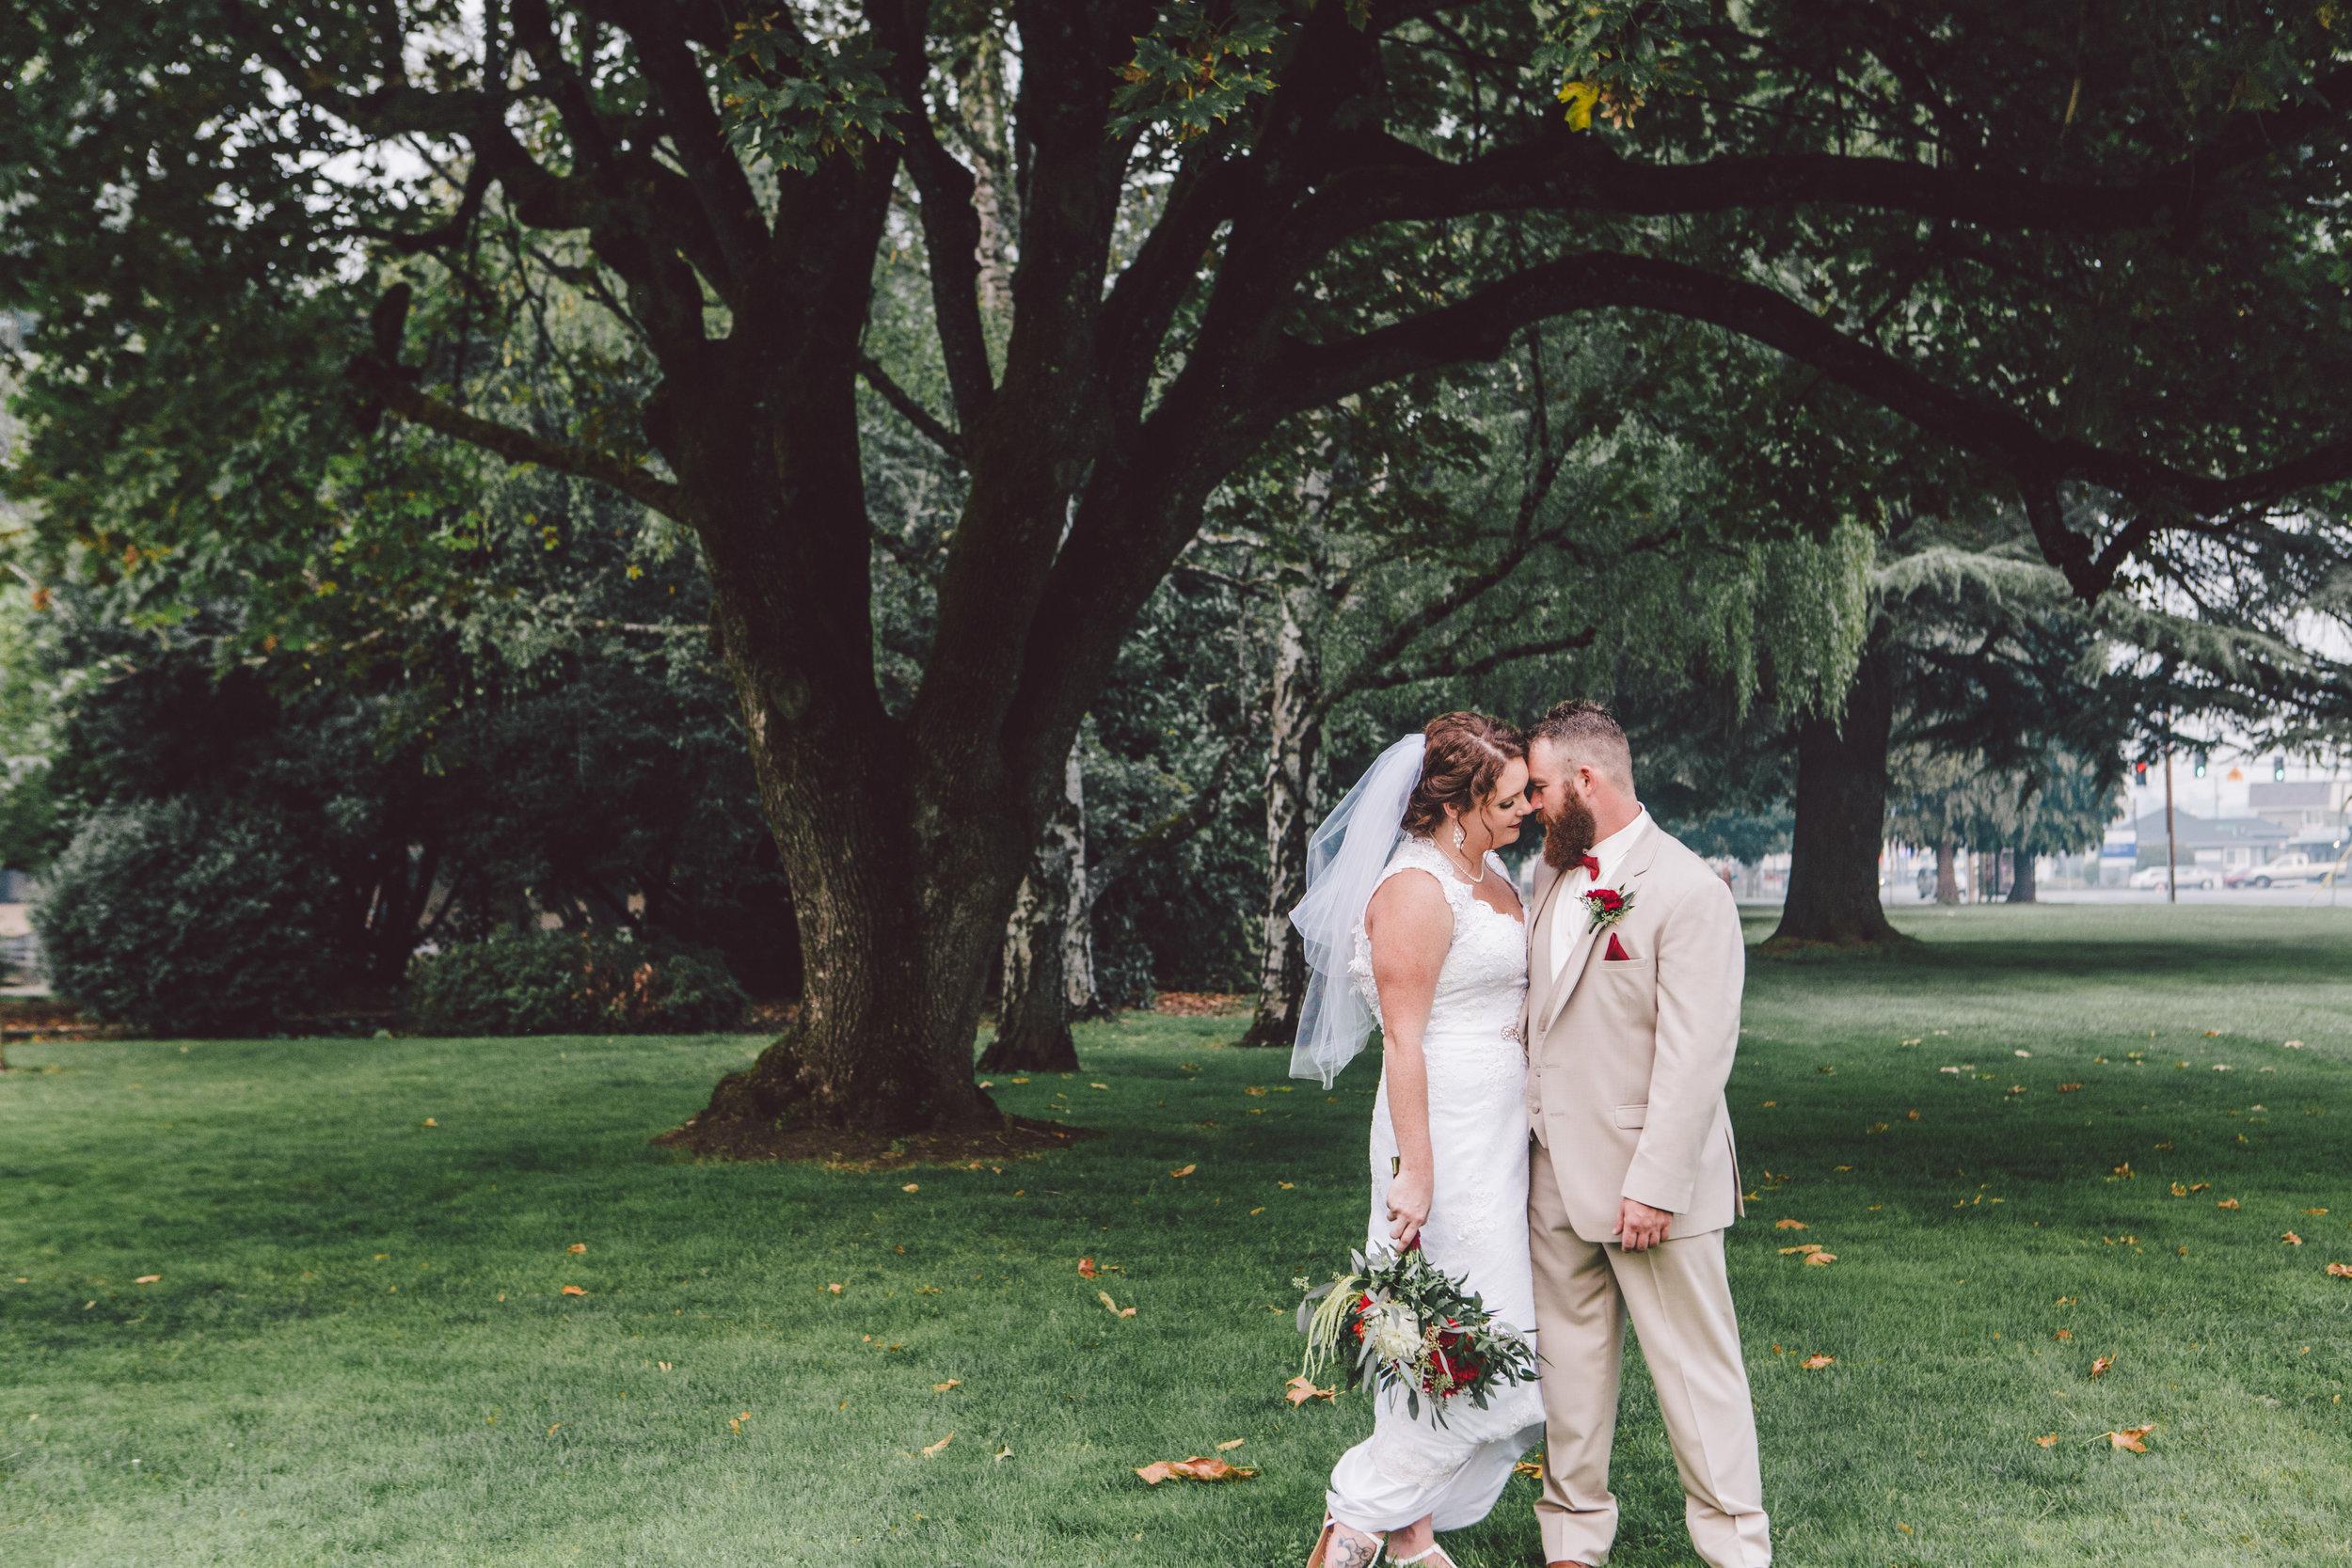 Kincheloe_Hutchings Wedding 2017 (686).jpg